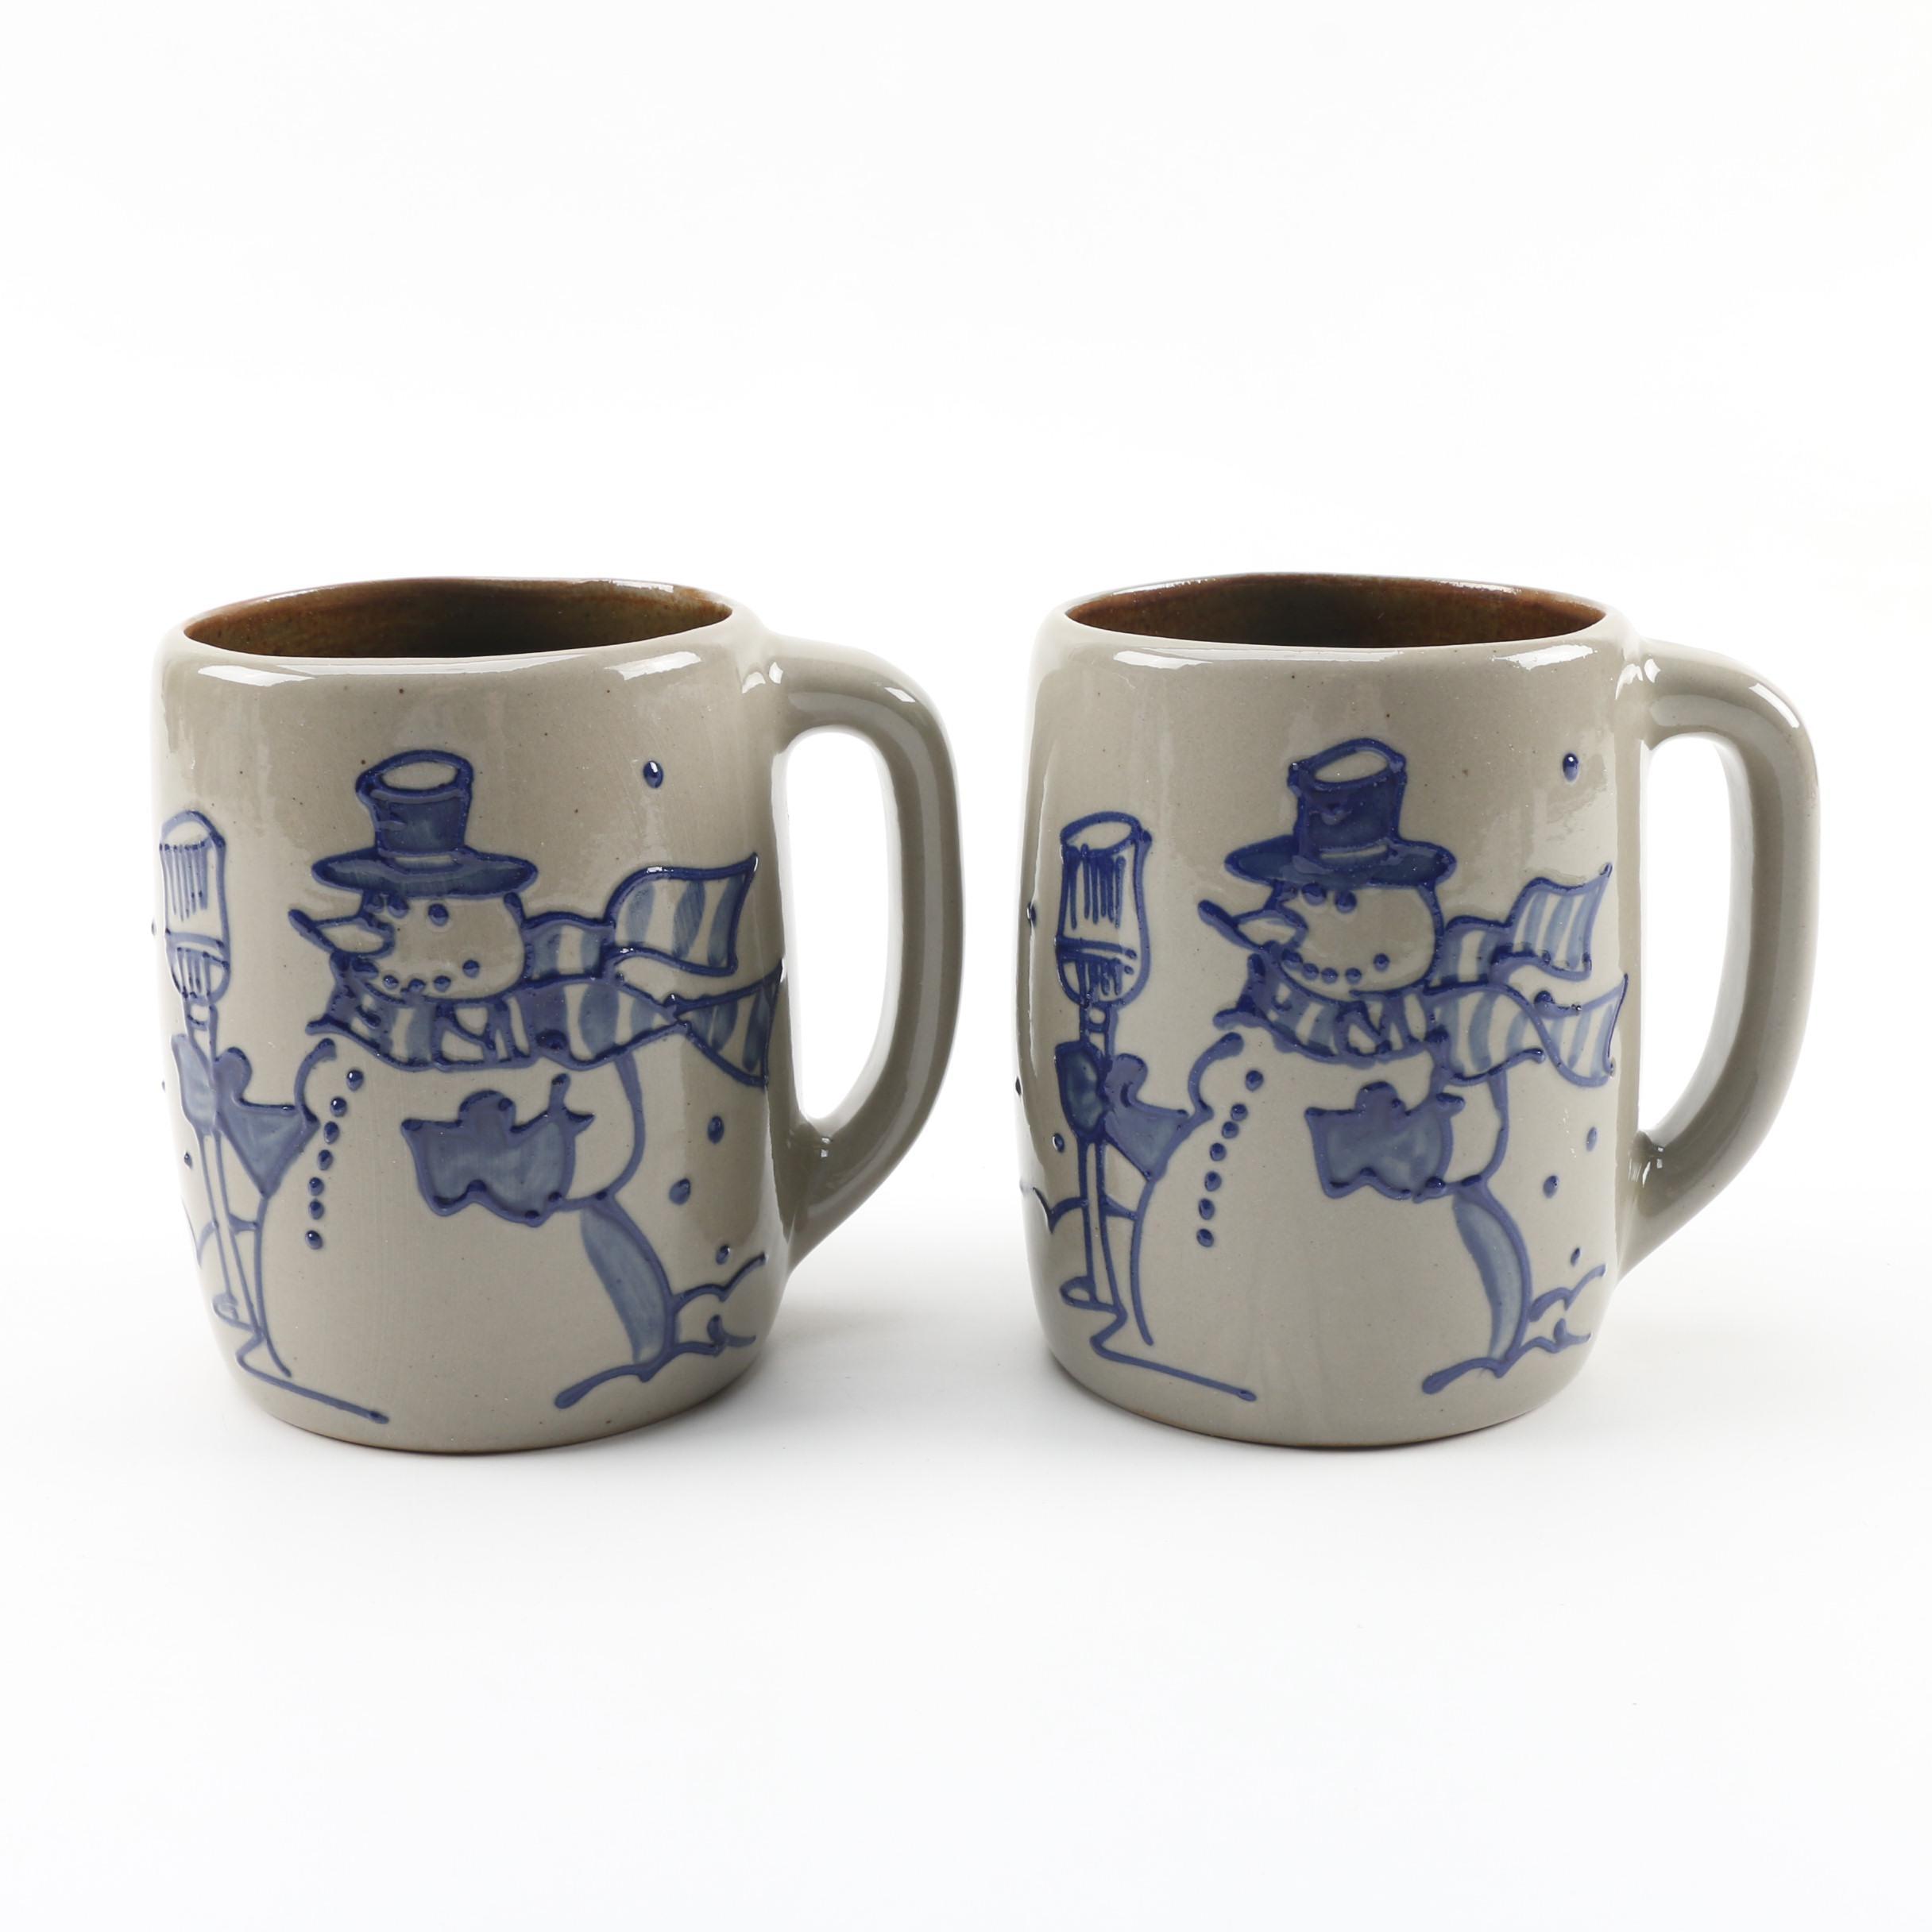 Beaumont Brothers Pottery Snowman Themed Salt Glazed Stoneware Mugs c. 1997